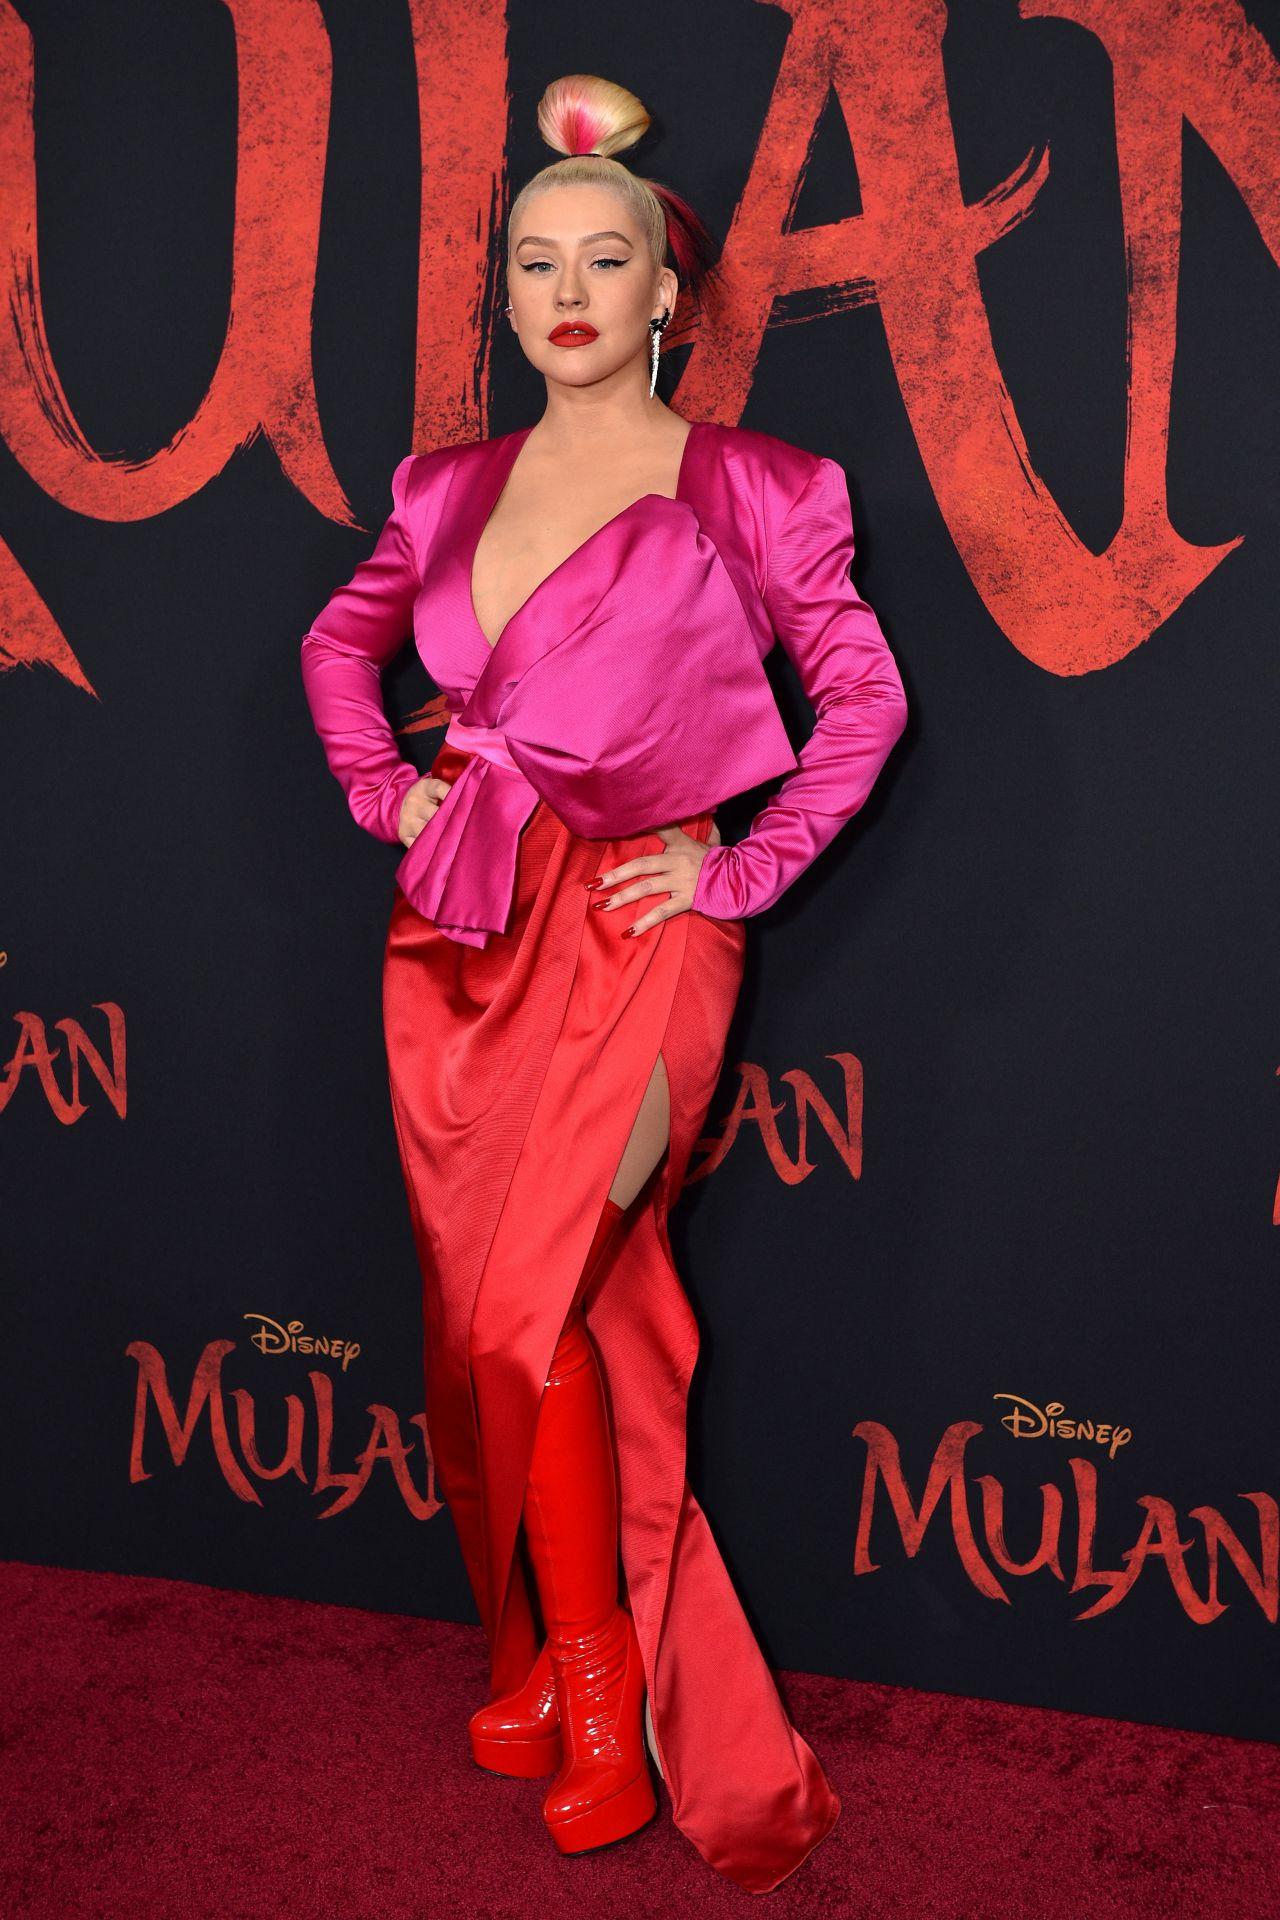 christina-aguilera-mulan-premiere-in-hollywood-0